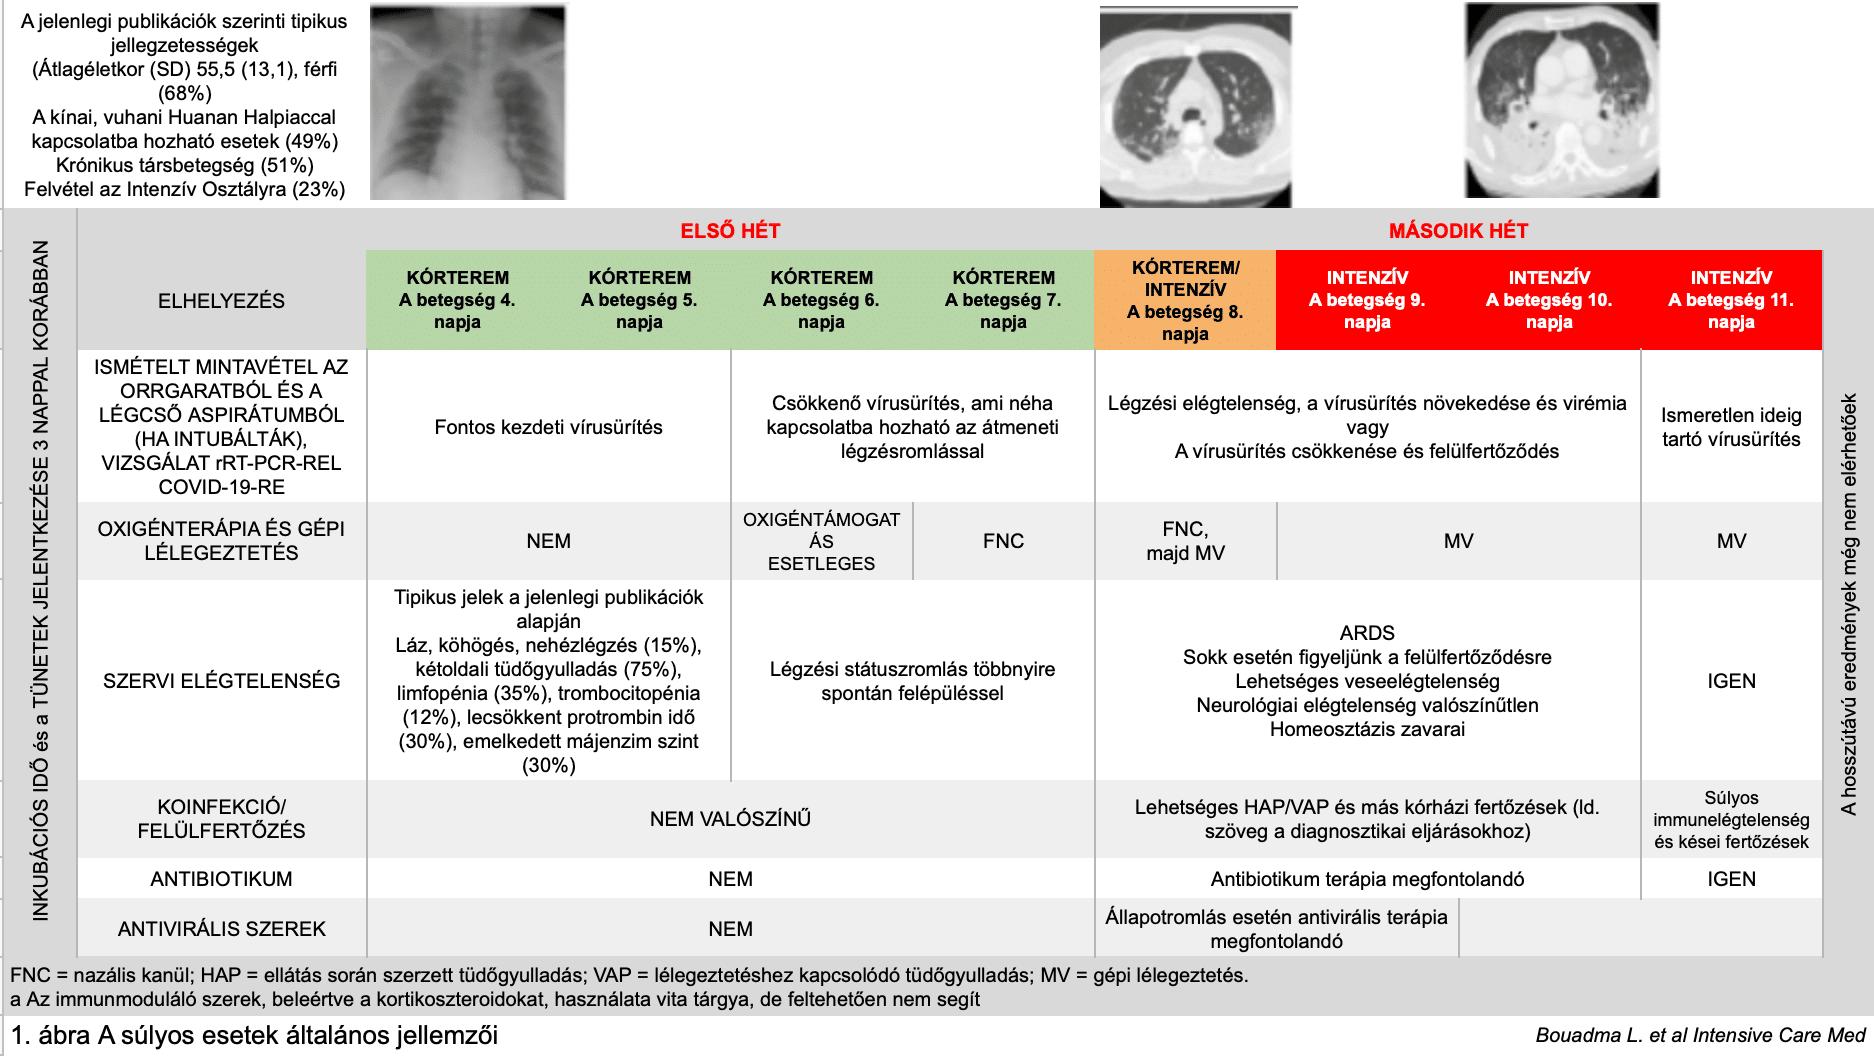 kardiopulmonáris hipertónia